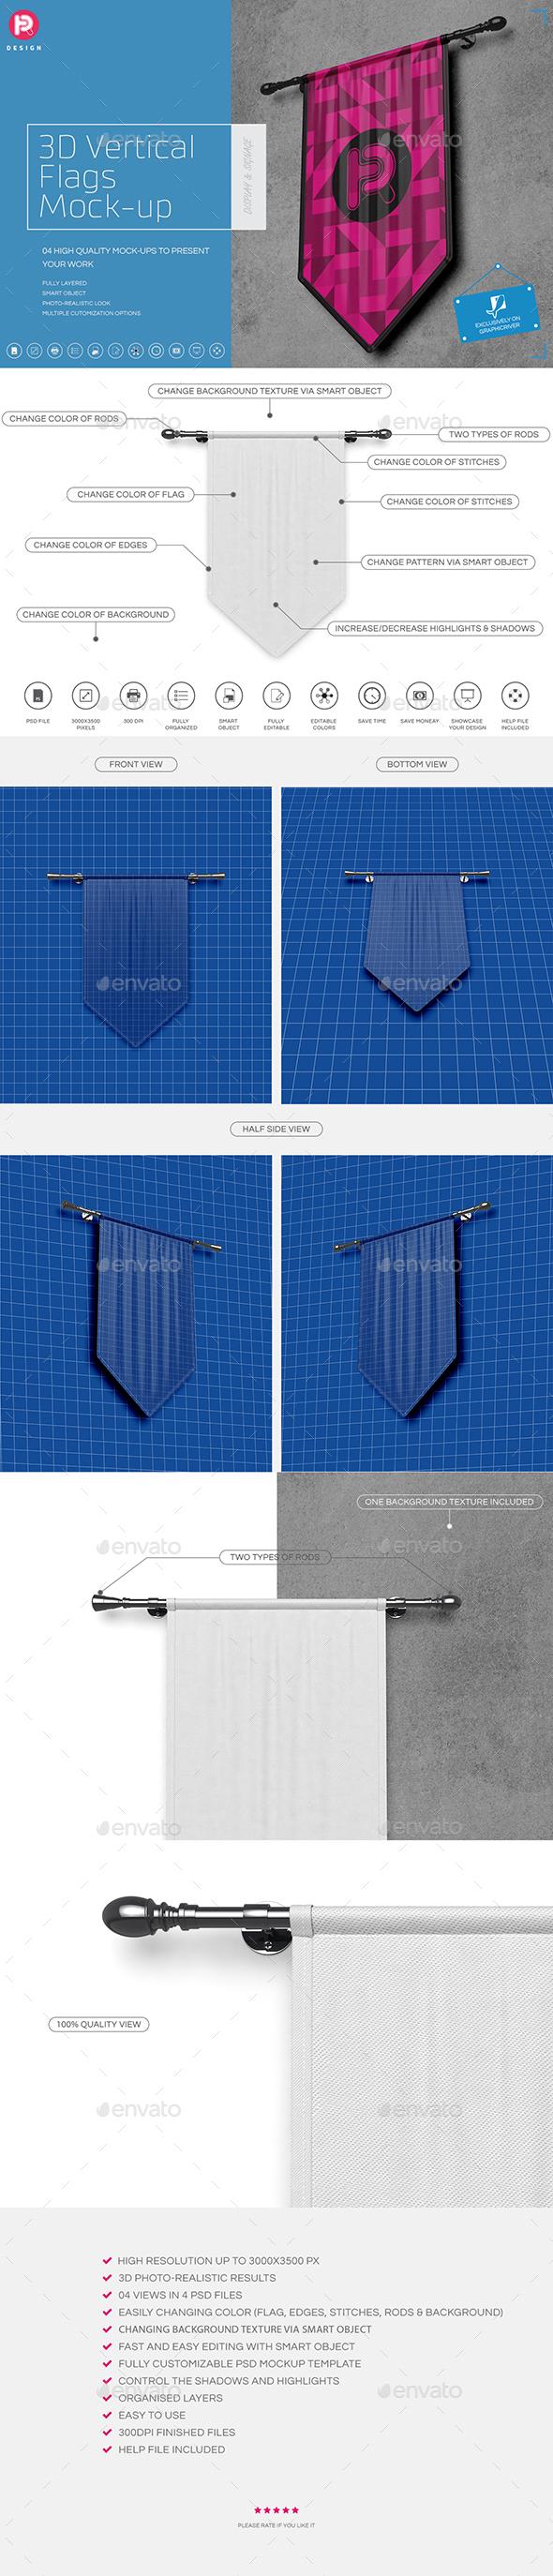 GraphicRiver 3D Vertical Flags Mock-Up set 1 20356461